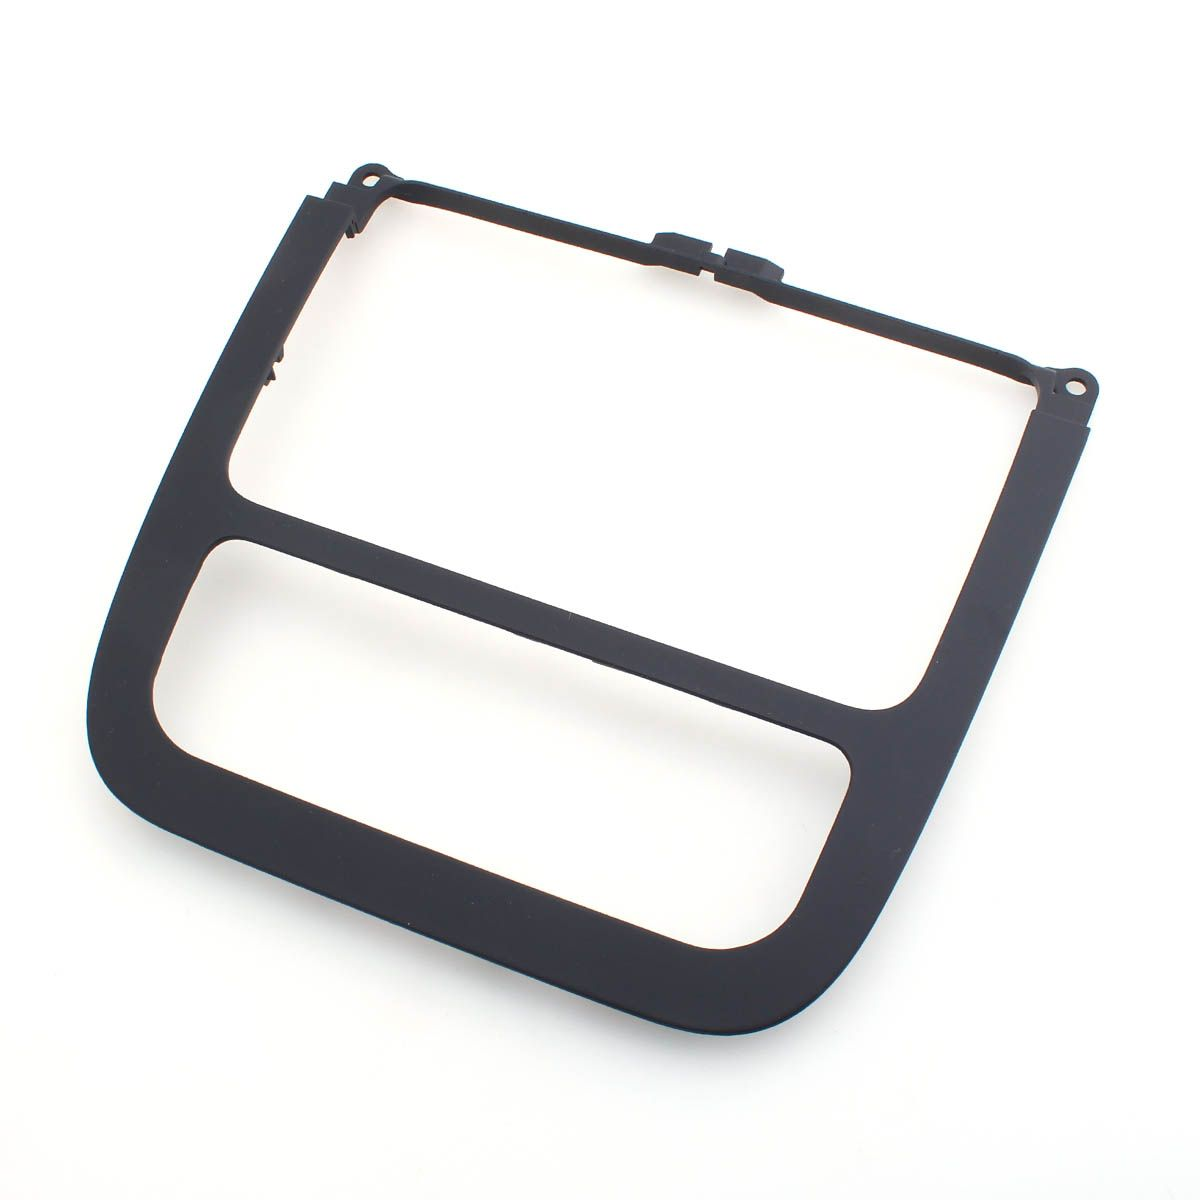 OEM Black Surround Cover Car Radio Trim for VW Jetta MK5 1KD858069